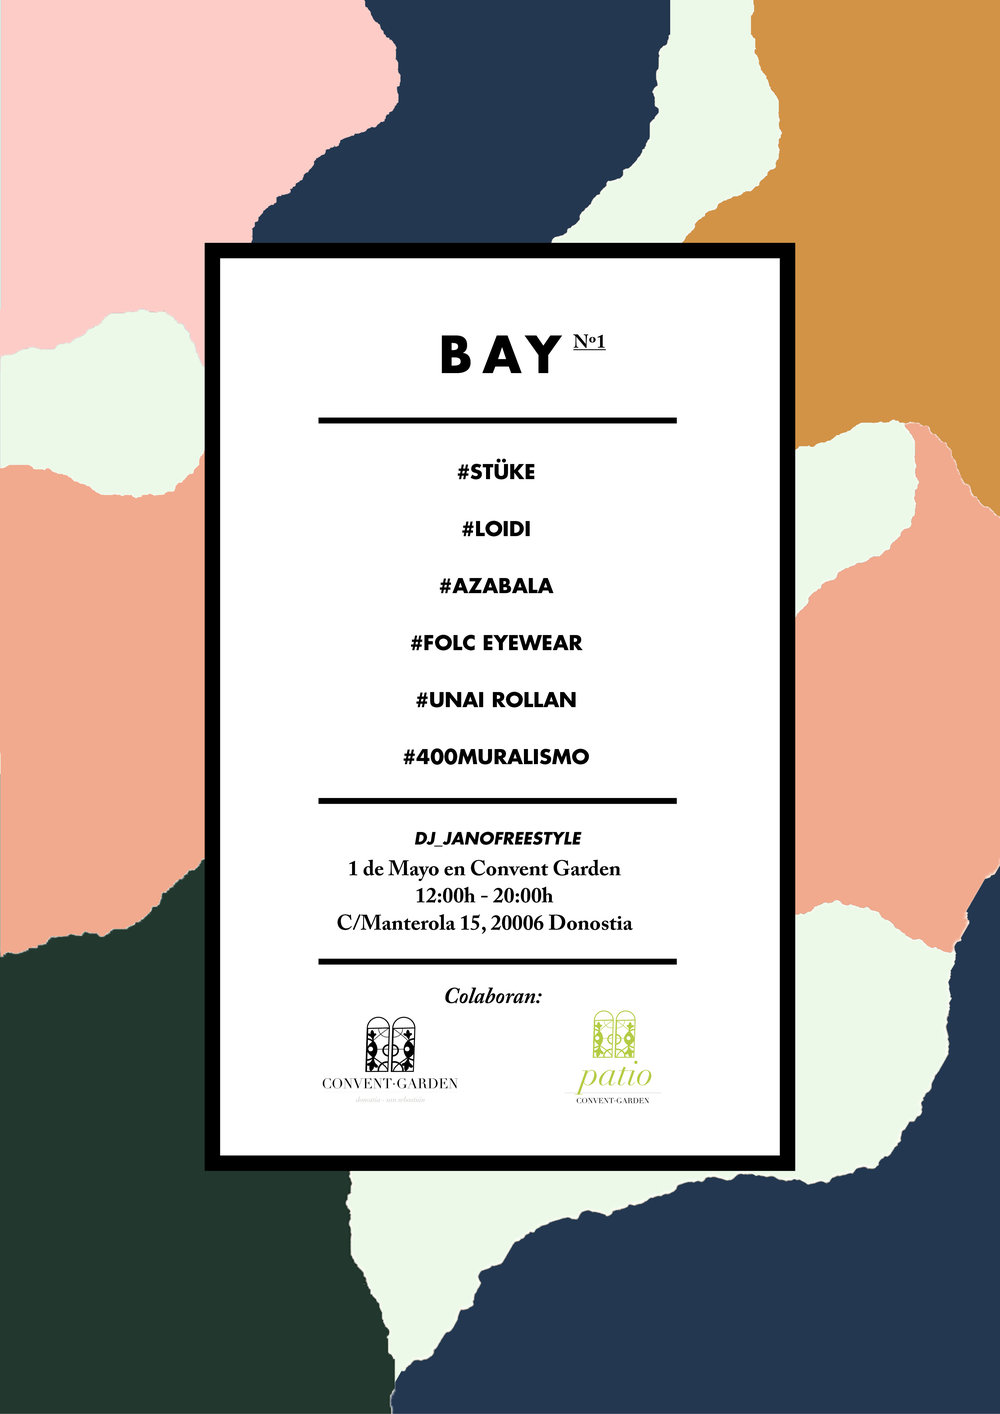 BAY TRADE SHOW - Location: Convent Garden C/Manterola 15 20006 San Sebastián.More info folc@folc-eyewear.com